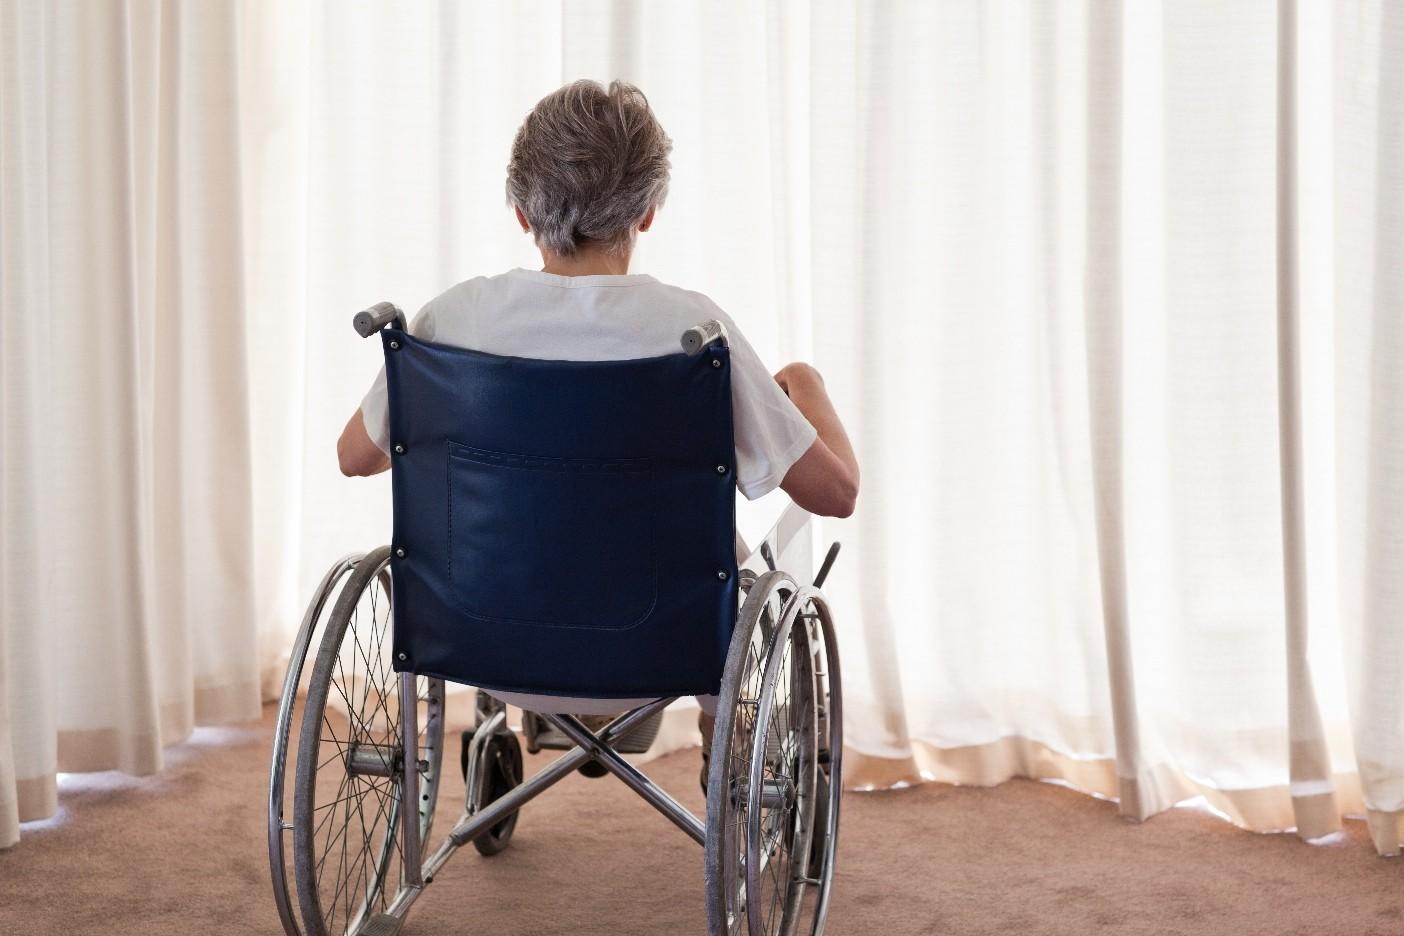 ВПетербурге лже-инвалид украла кресло-каталку